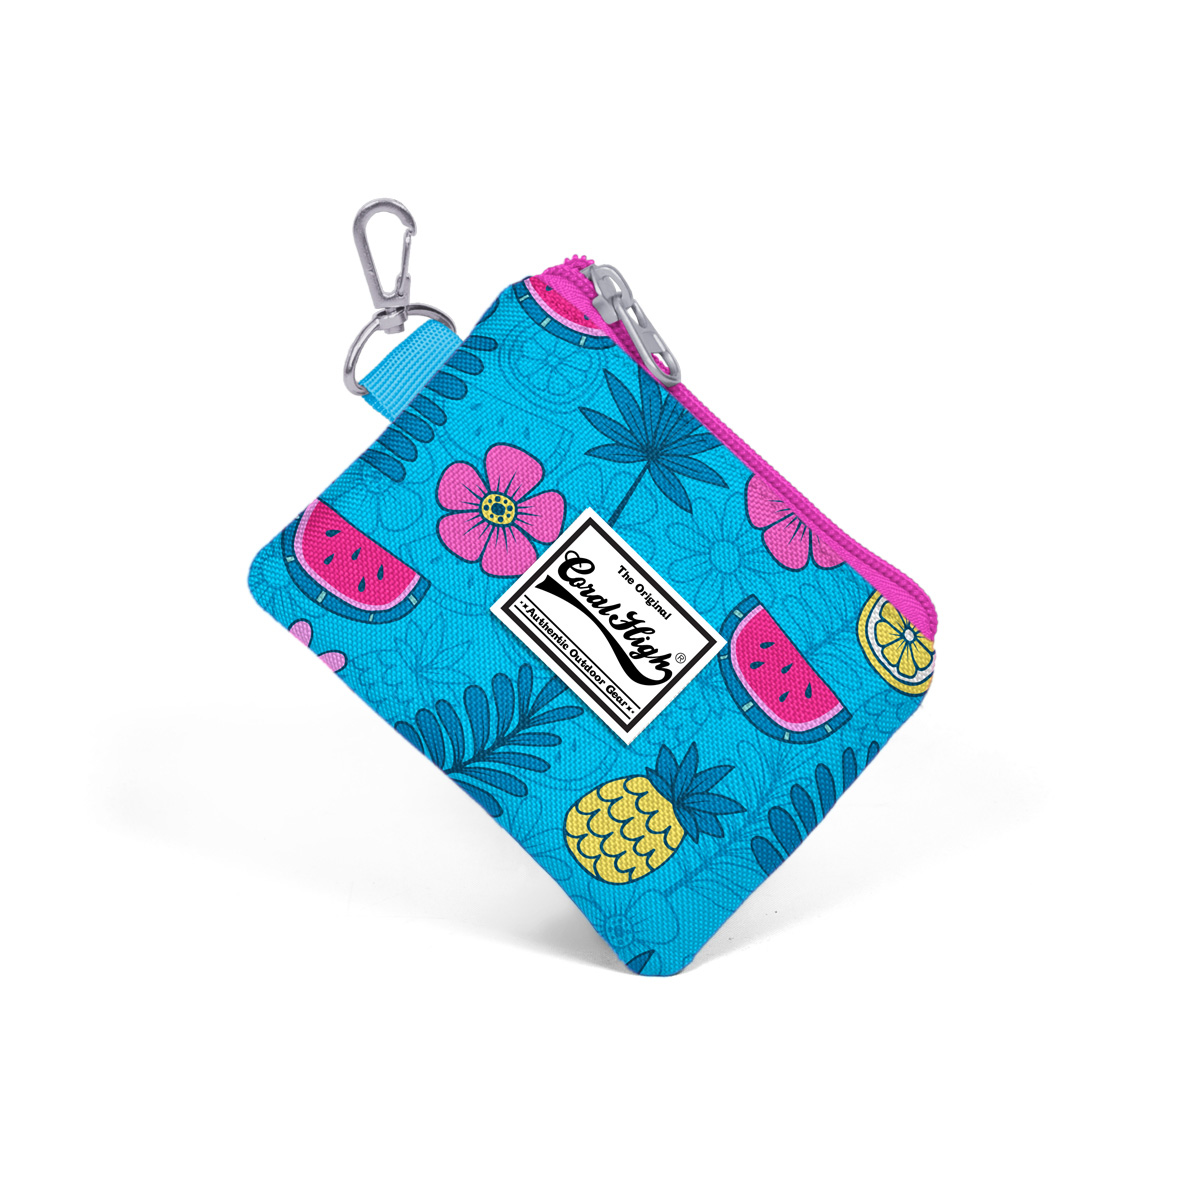 Coral High KIDS - Coral High Kids Mavi Tropikal Desenli Bozuk Para Çantası